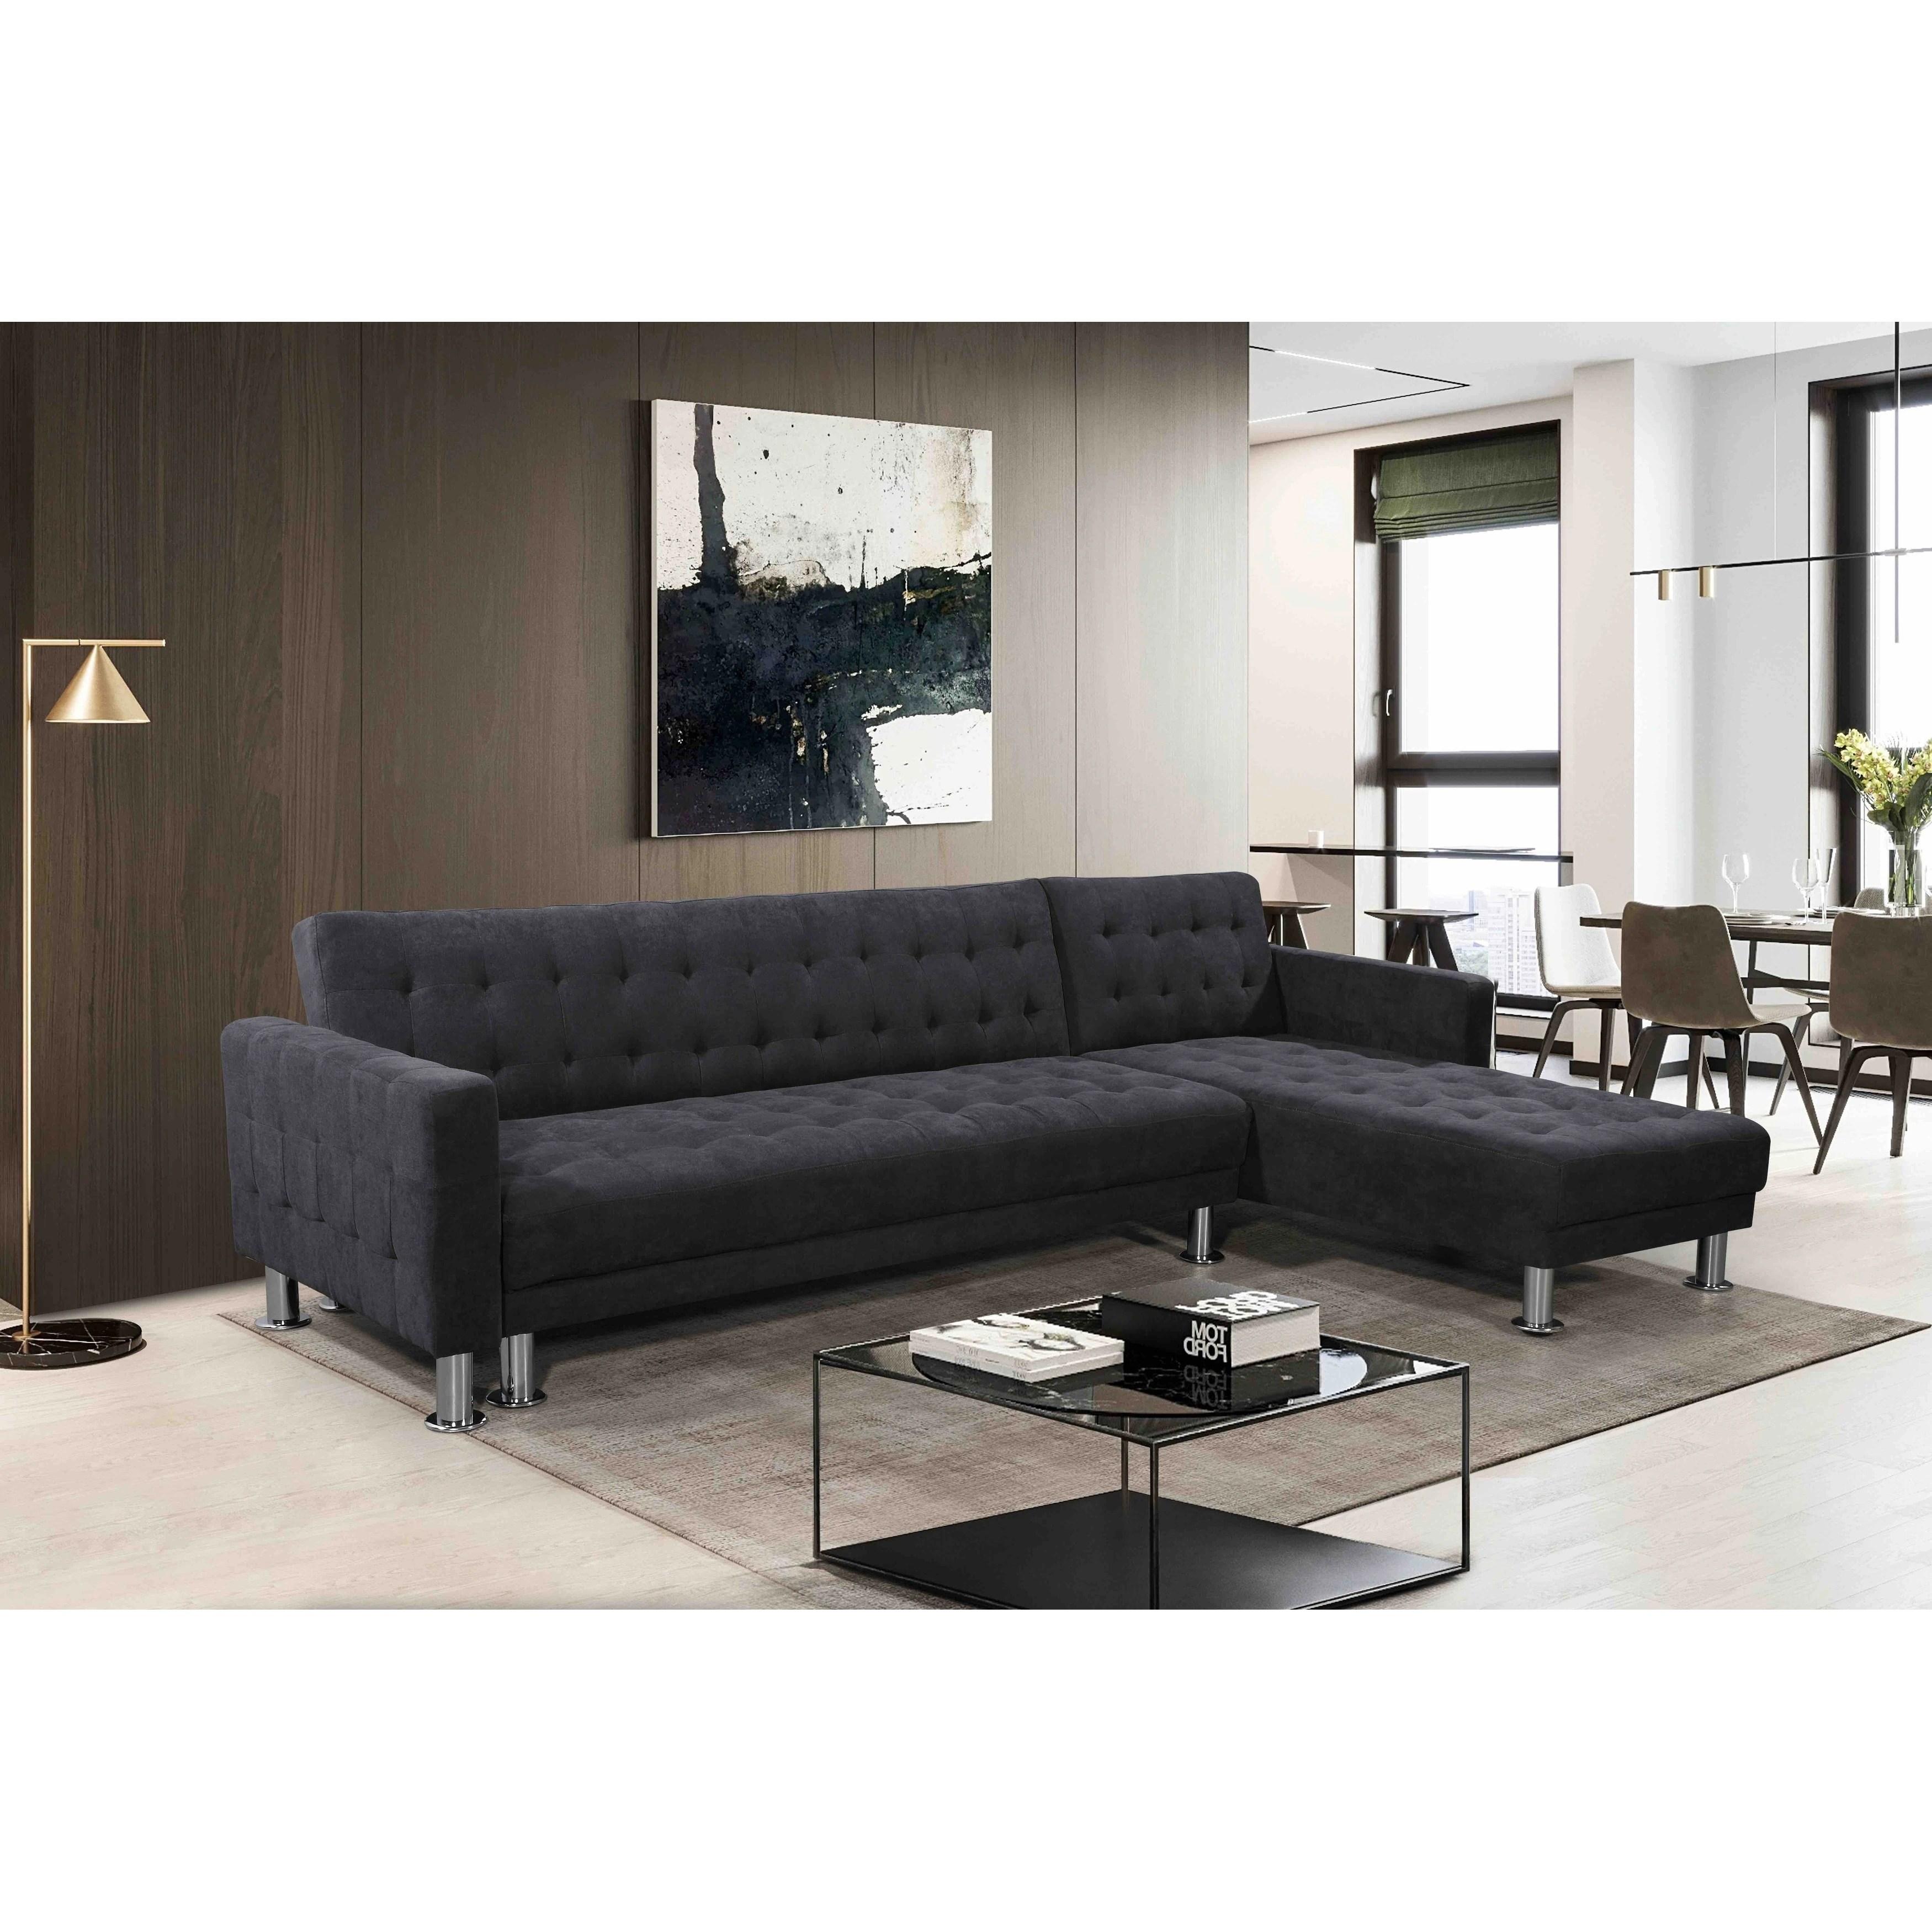 Convertible Fabric Sectional Sleeper Sofa Attalens